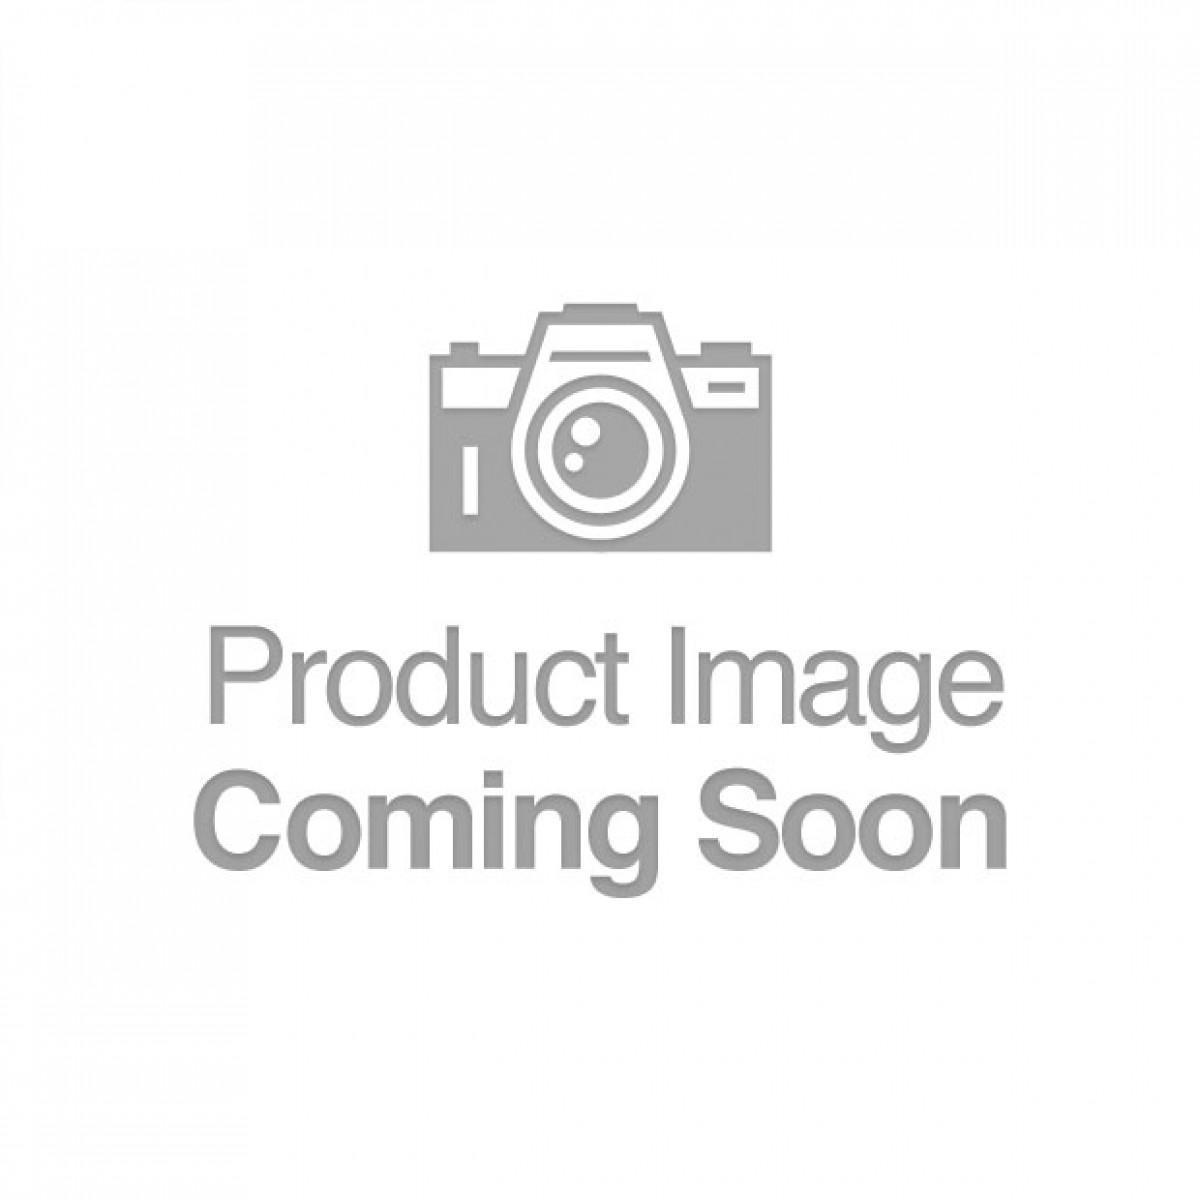 Trojan Enz Lubricated Condoms - Box Of 12